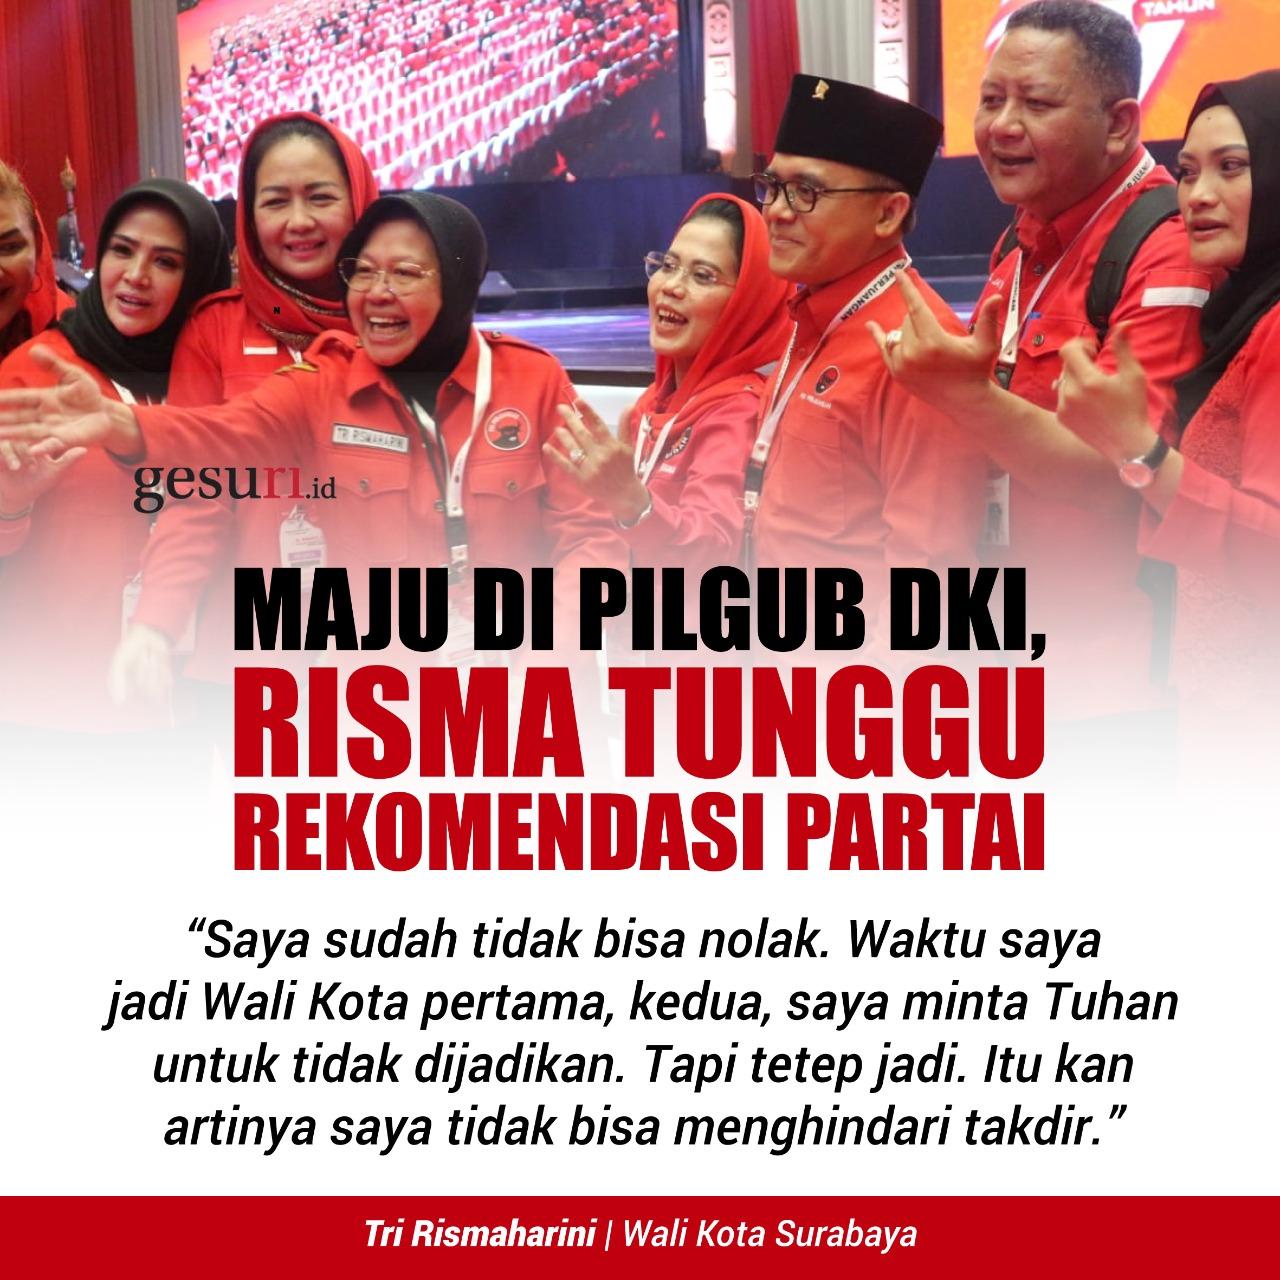 Maju di Pilgub DKI, Risma Tunggu Rekomendasi Partai